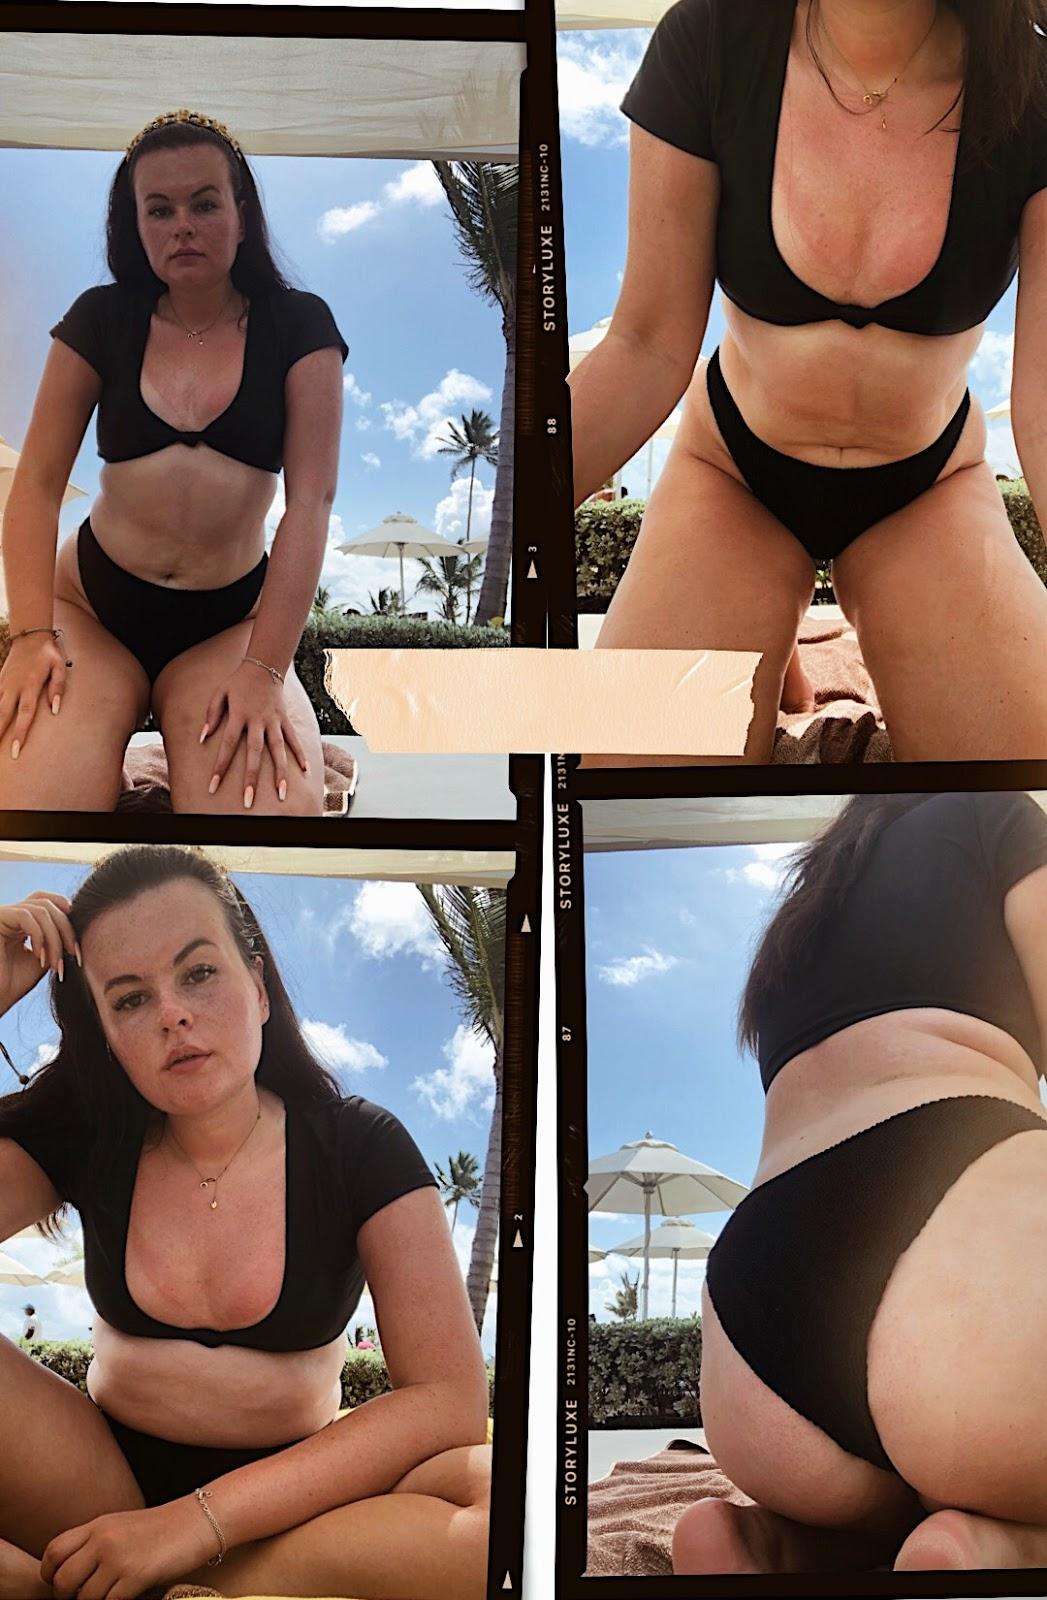 south beach bikini, body confidence, body positive bloggers uk, how to feel good in a bikini, how to be bikini ready, how to wear a bikini,